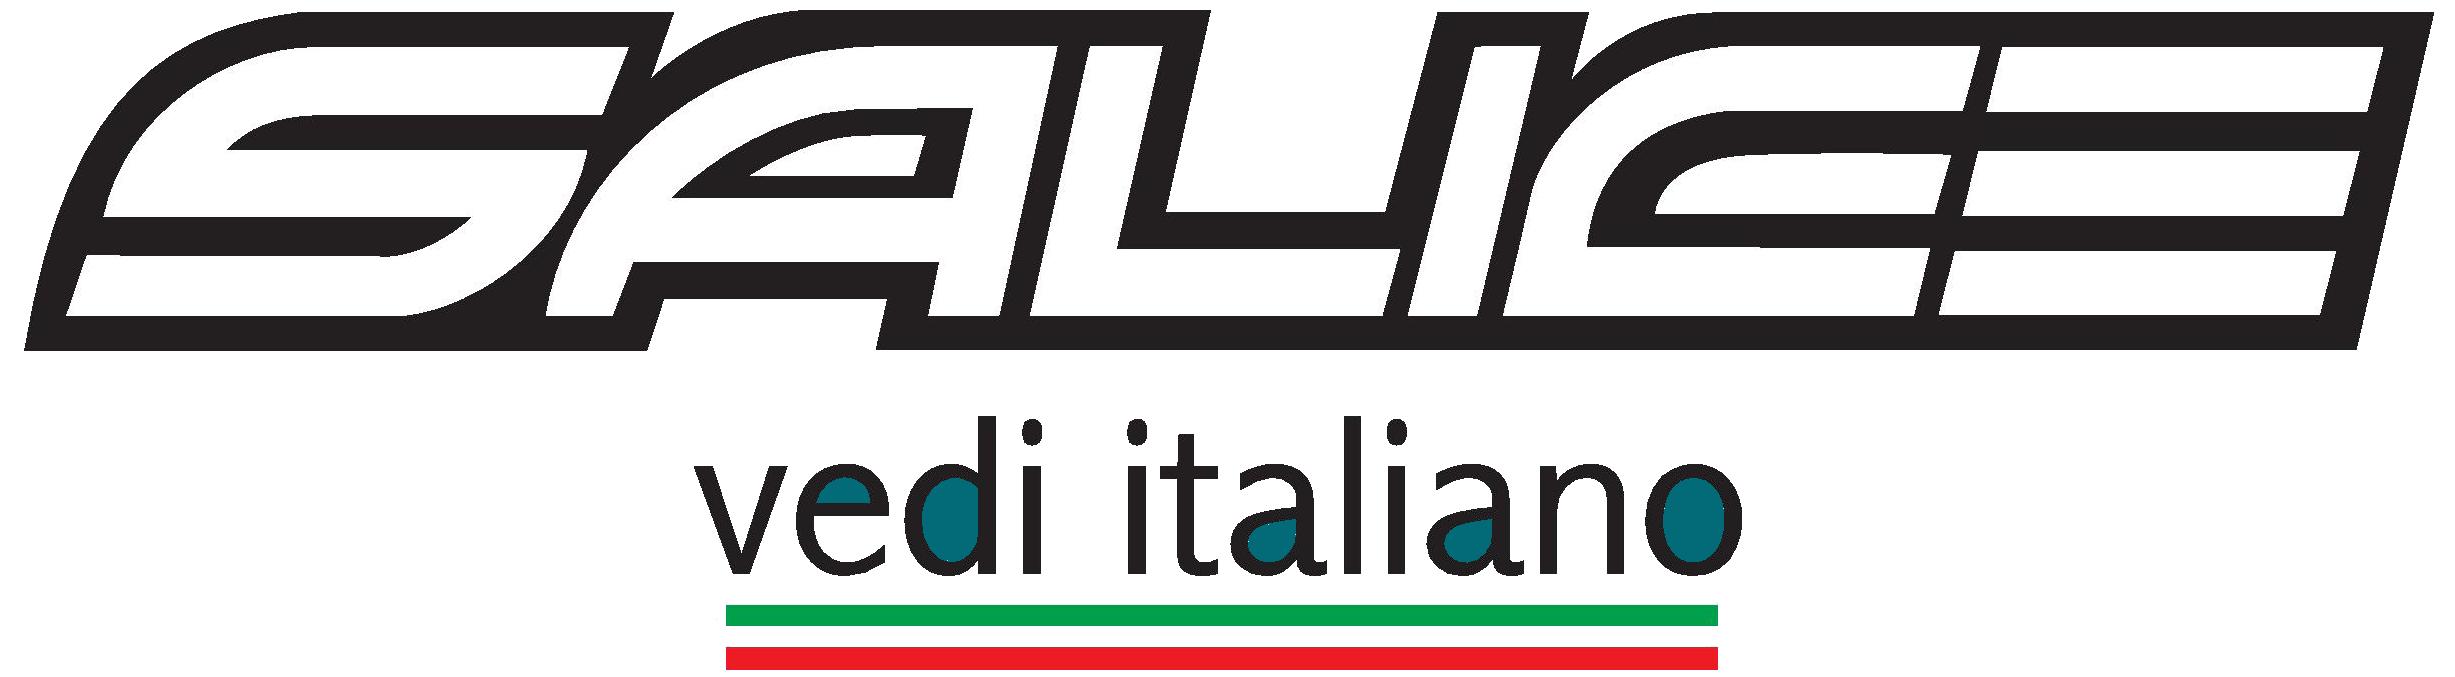 sponsor 5